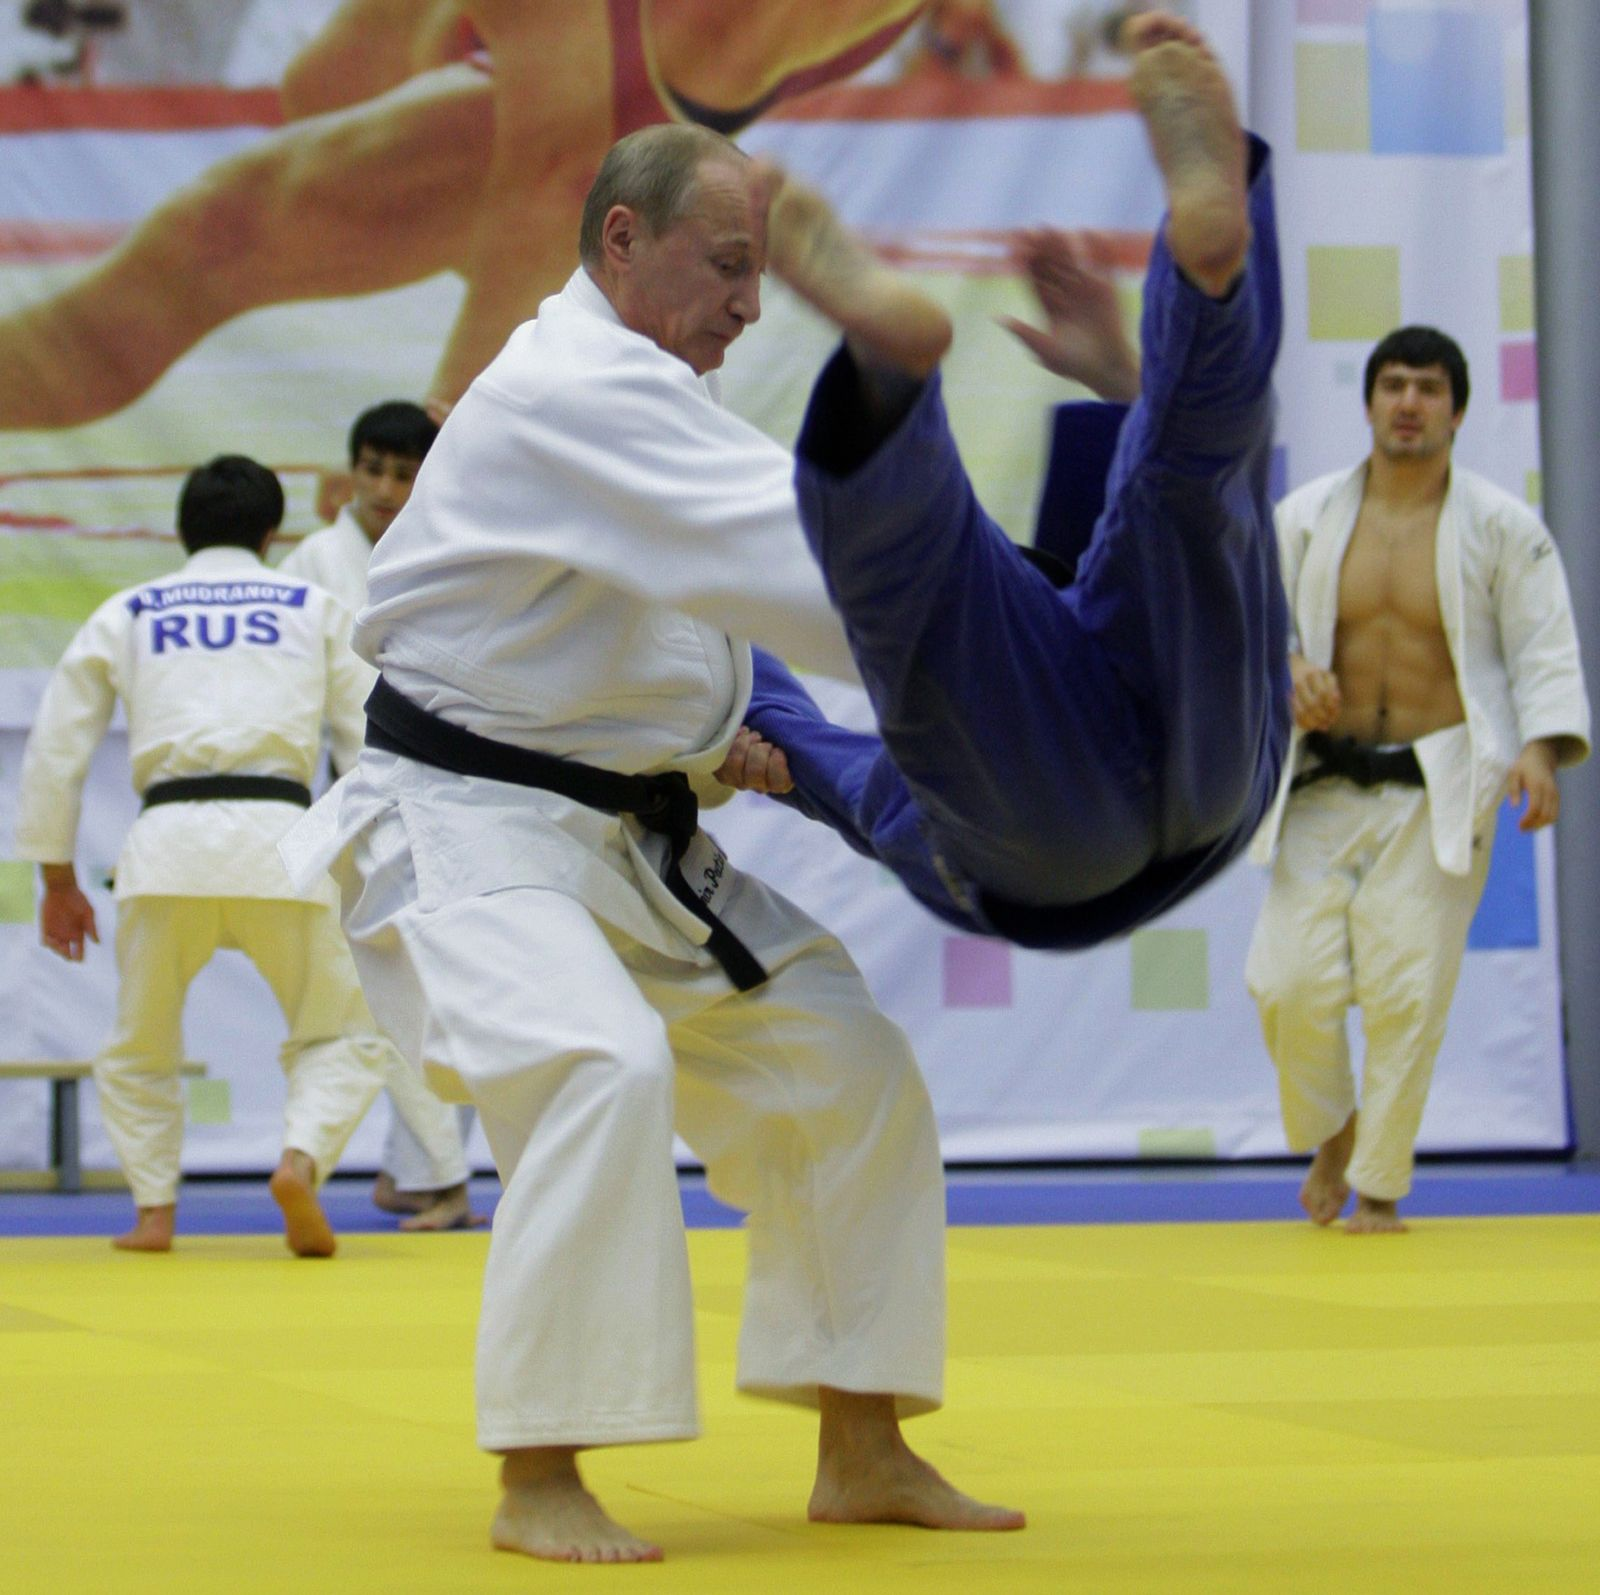 Wladimir Putin / Judo